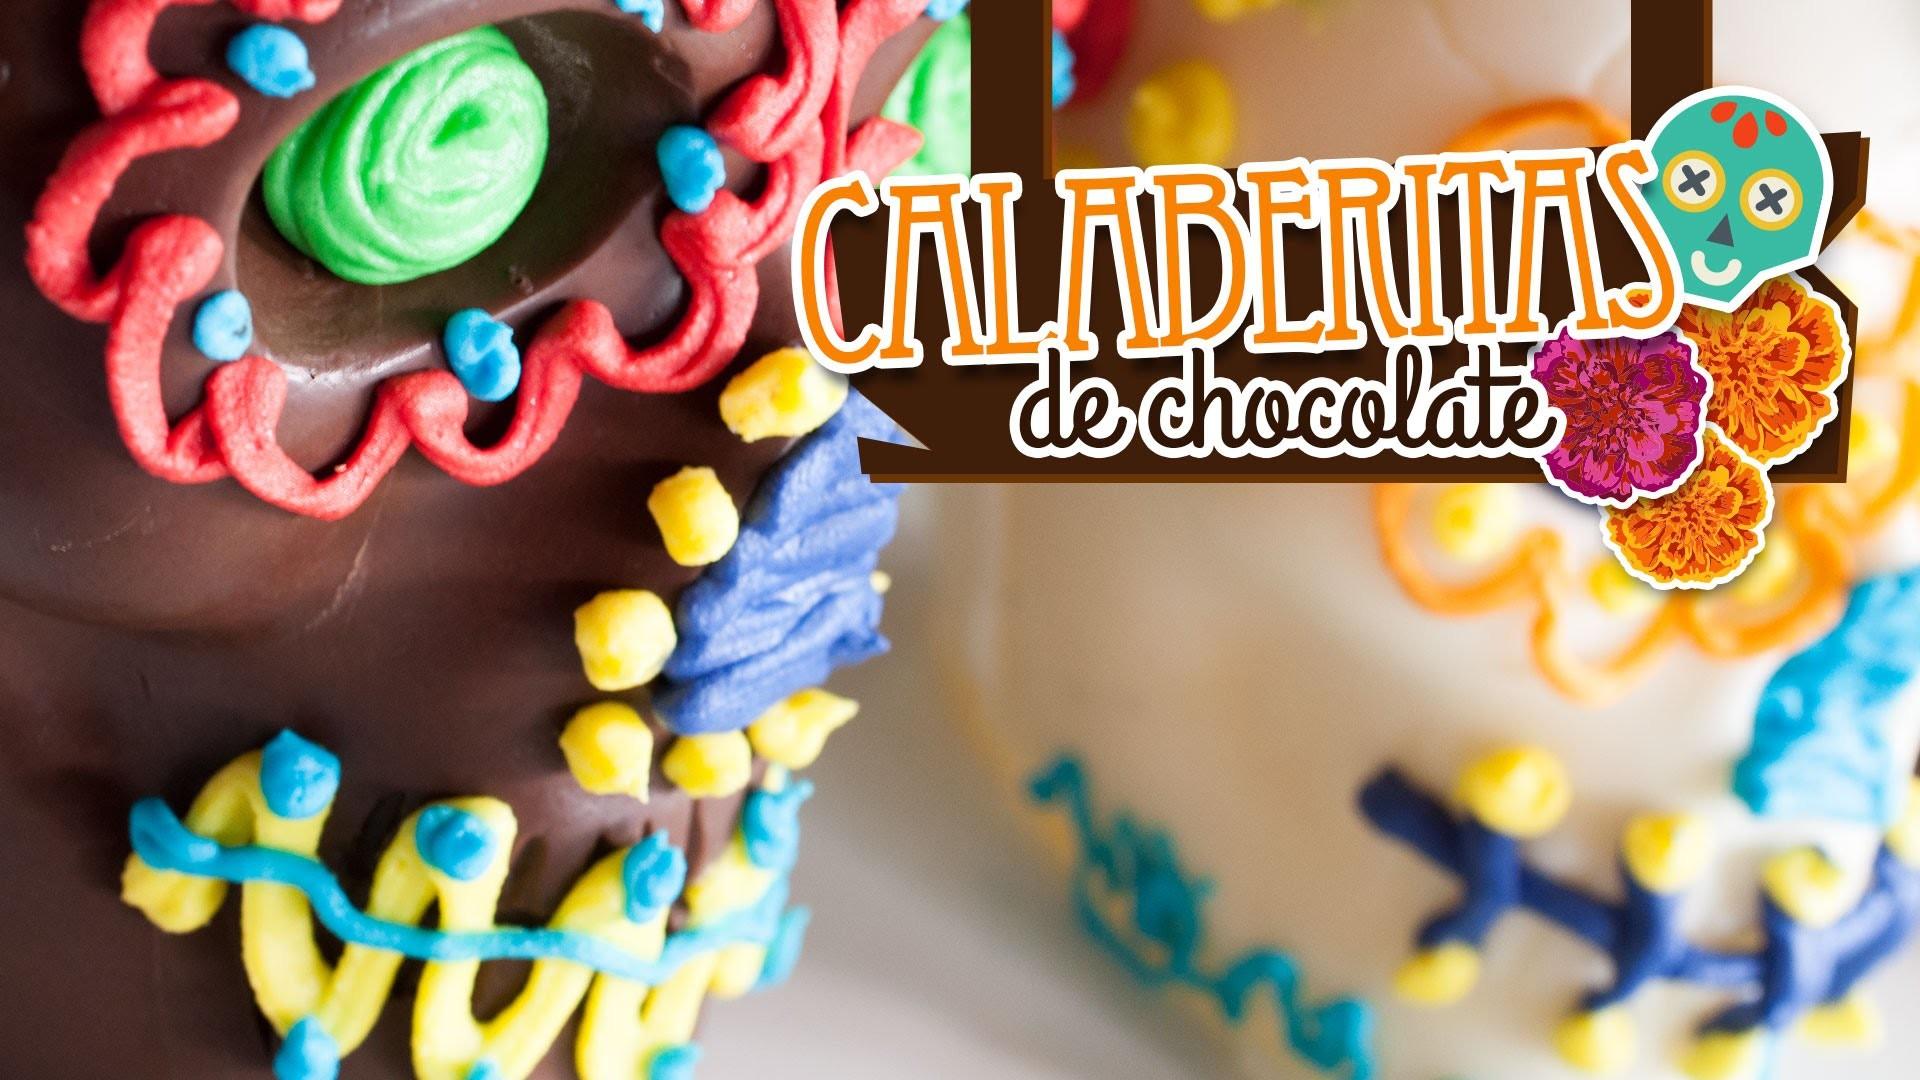 Calaveritas de Chocolate